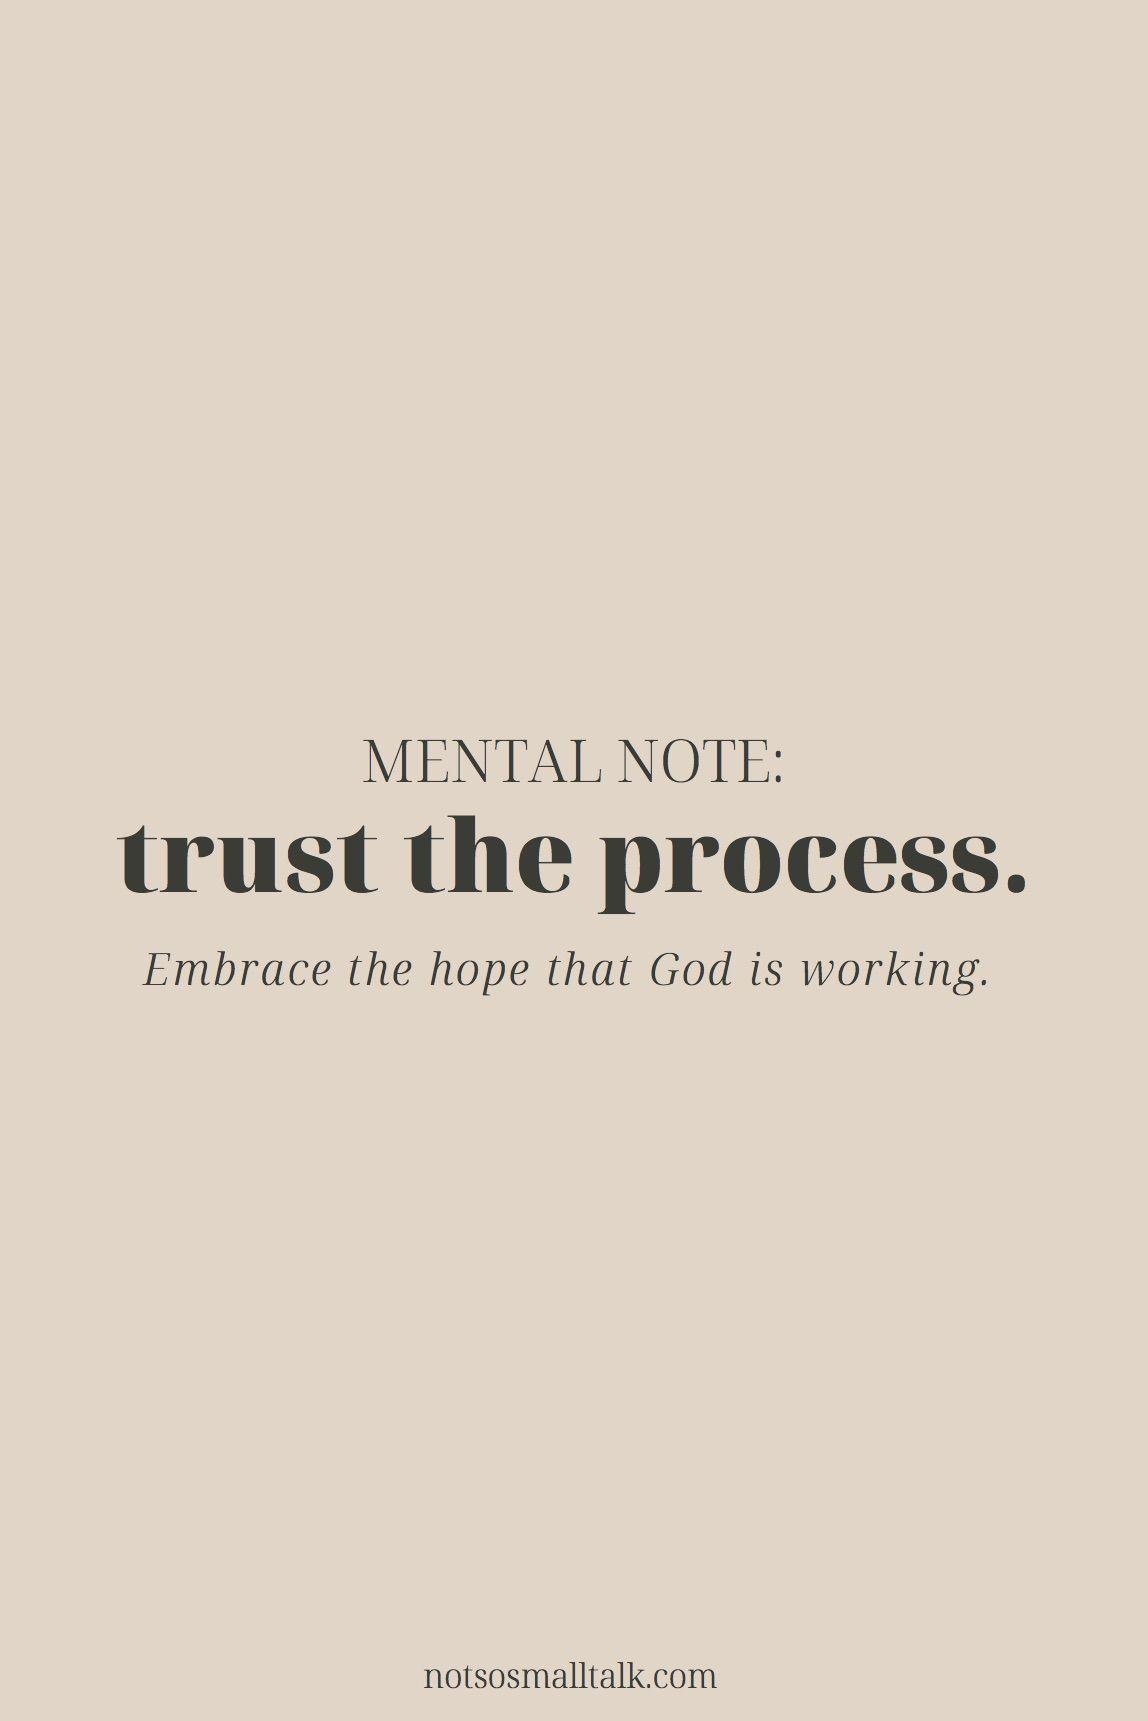 When Prayers Seem to Go Unanswered